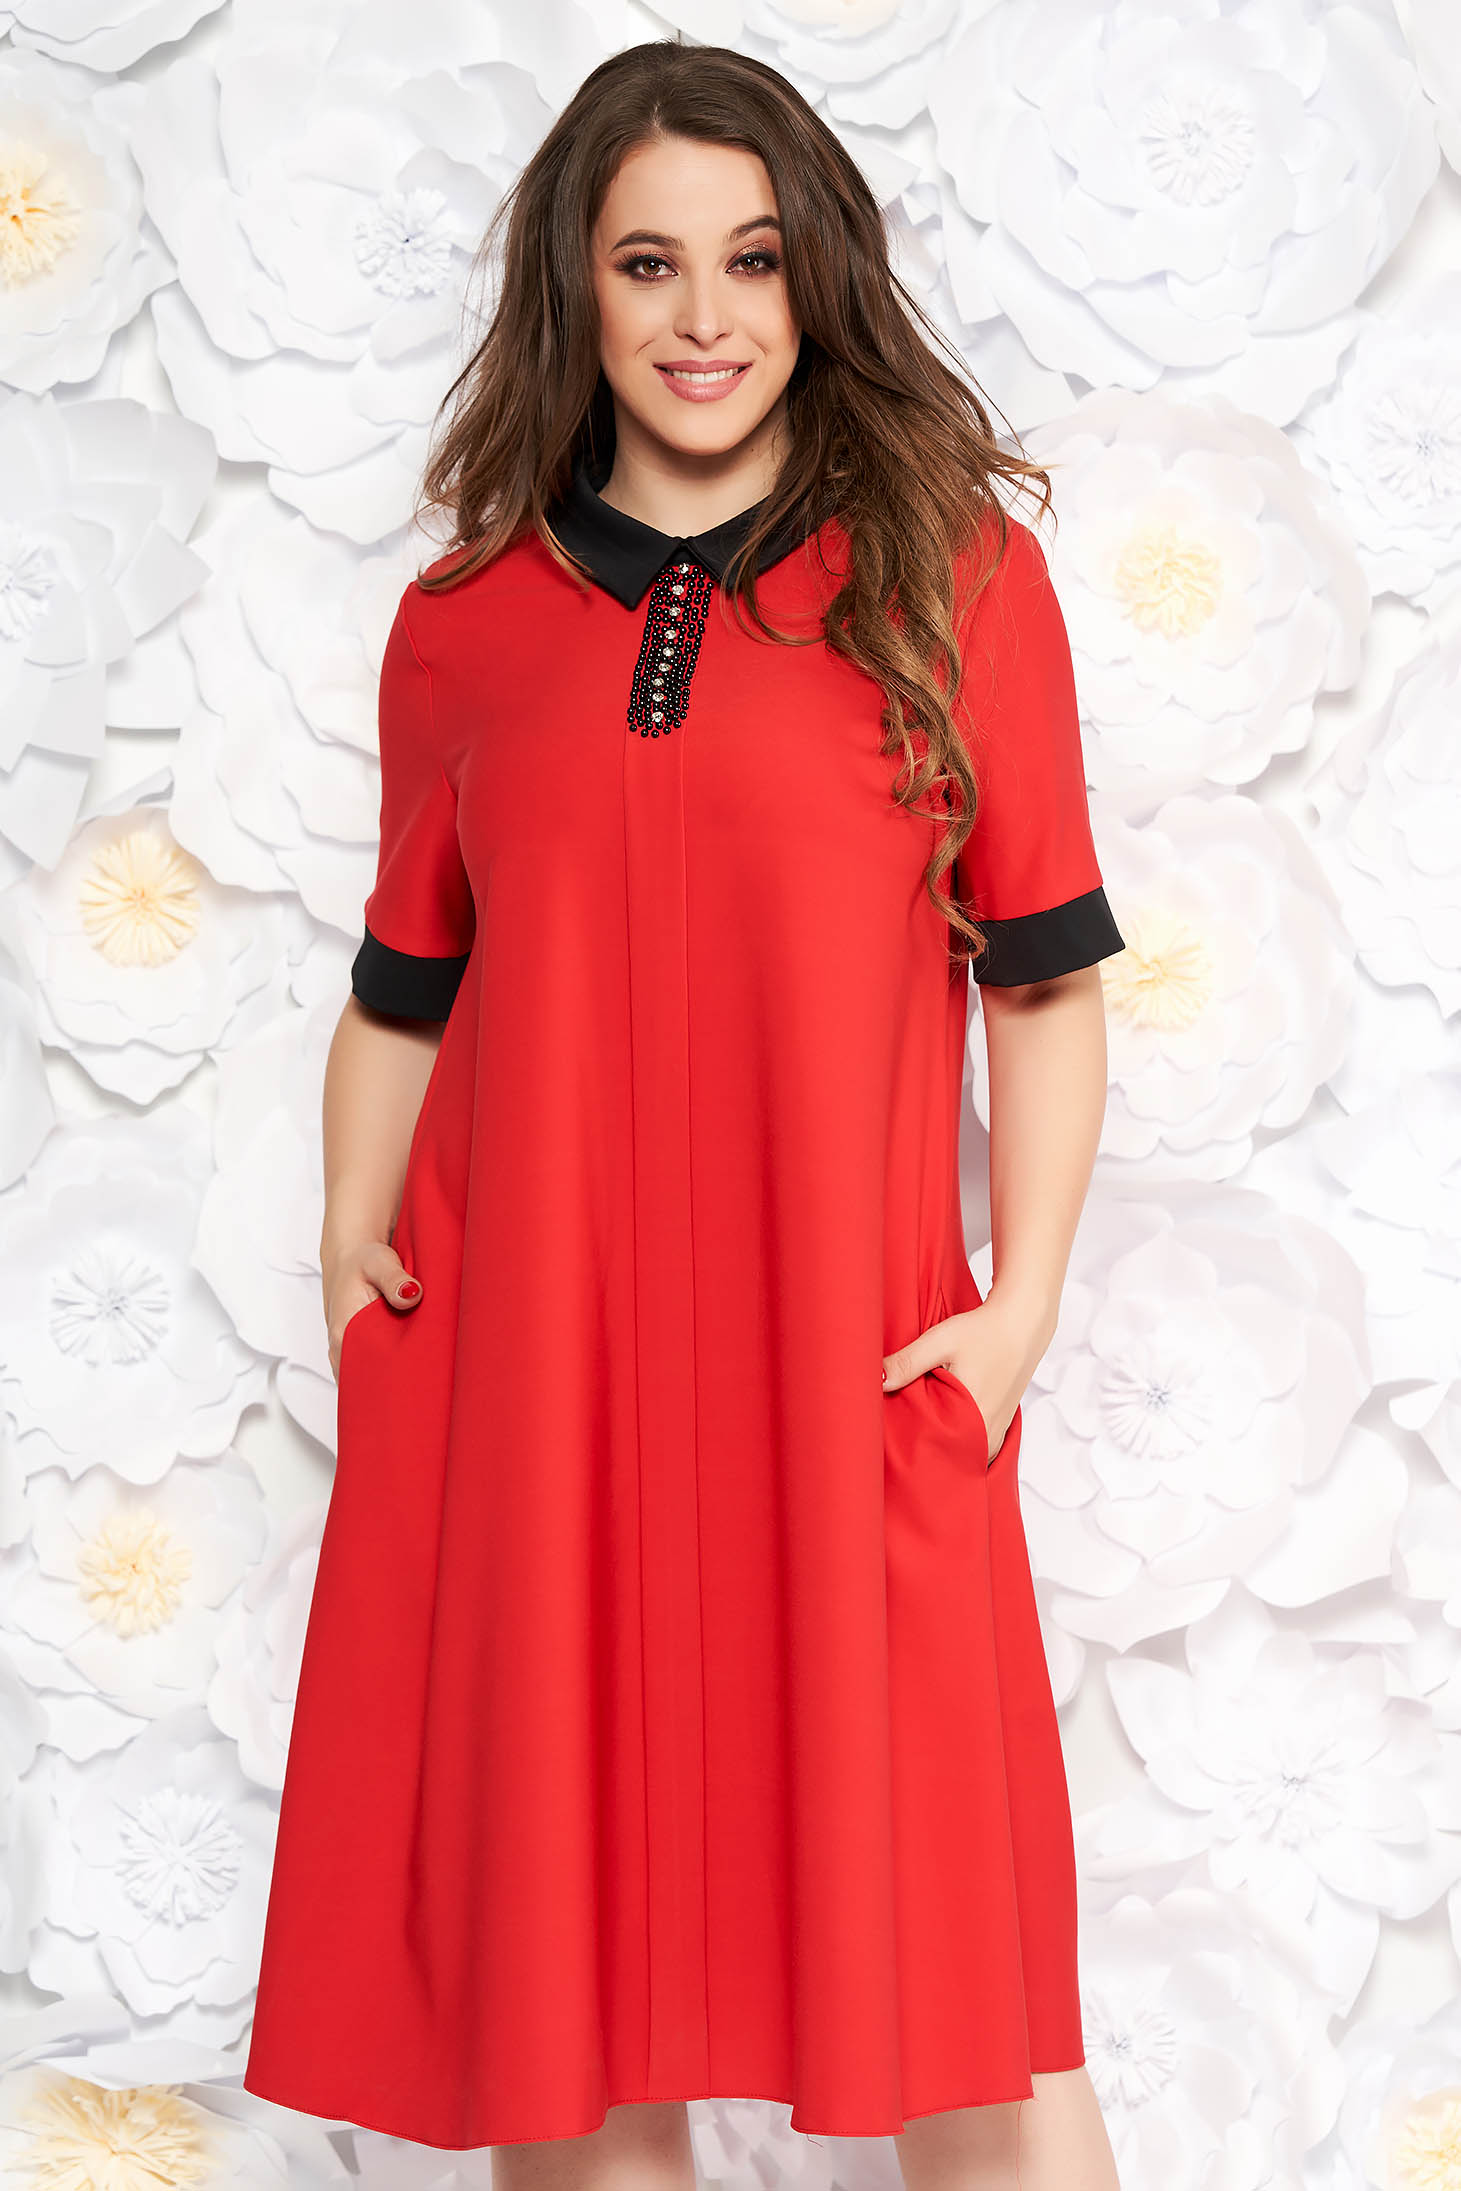 Red elegant flared dress slightly elastic fabric with crystal embellished details with pockets